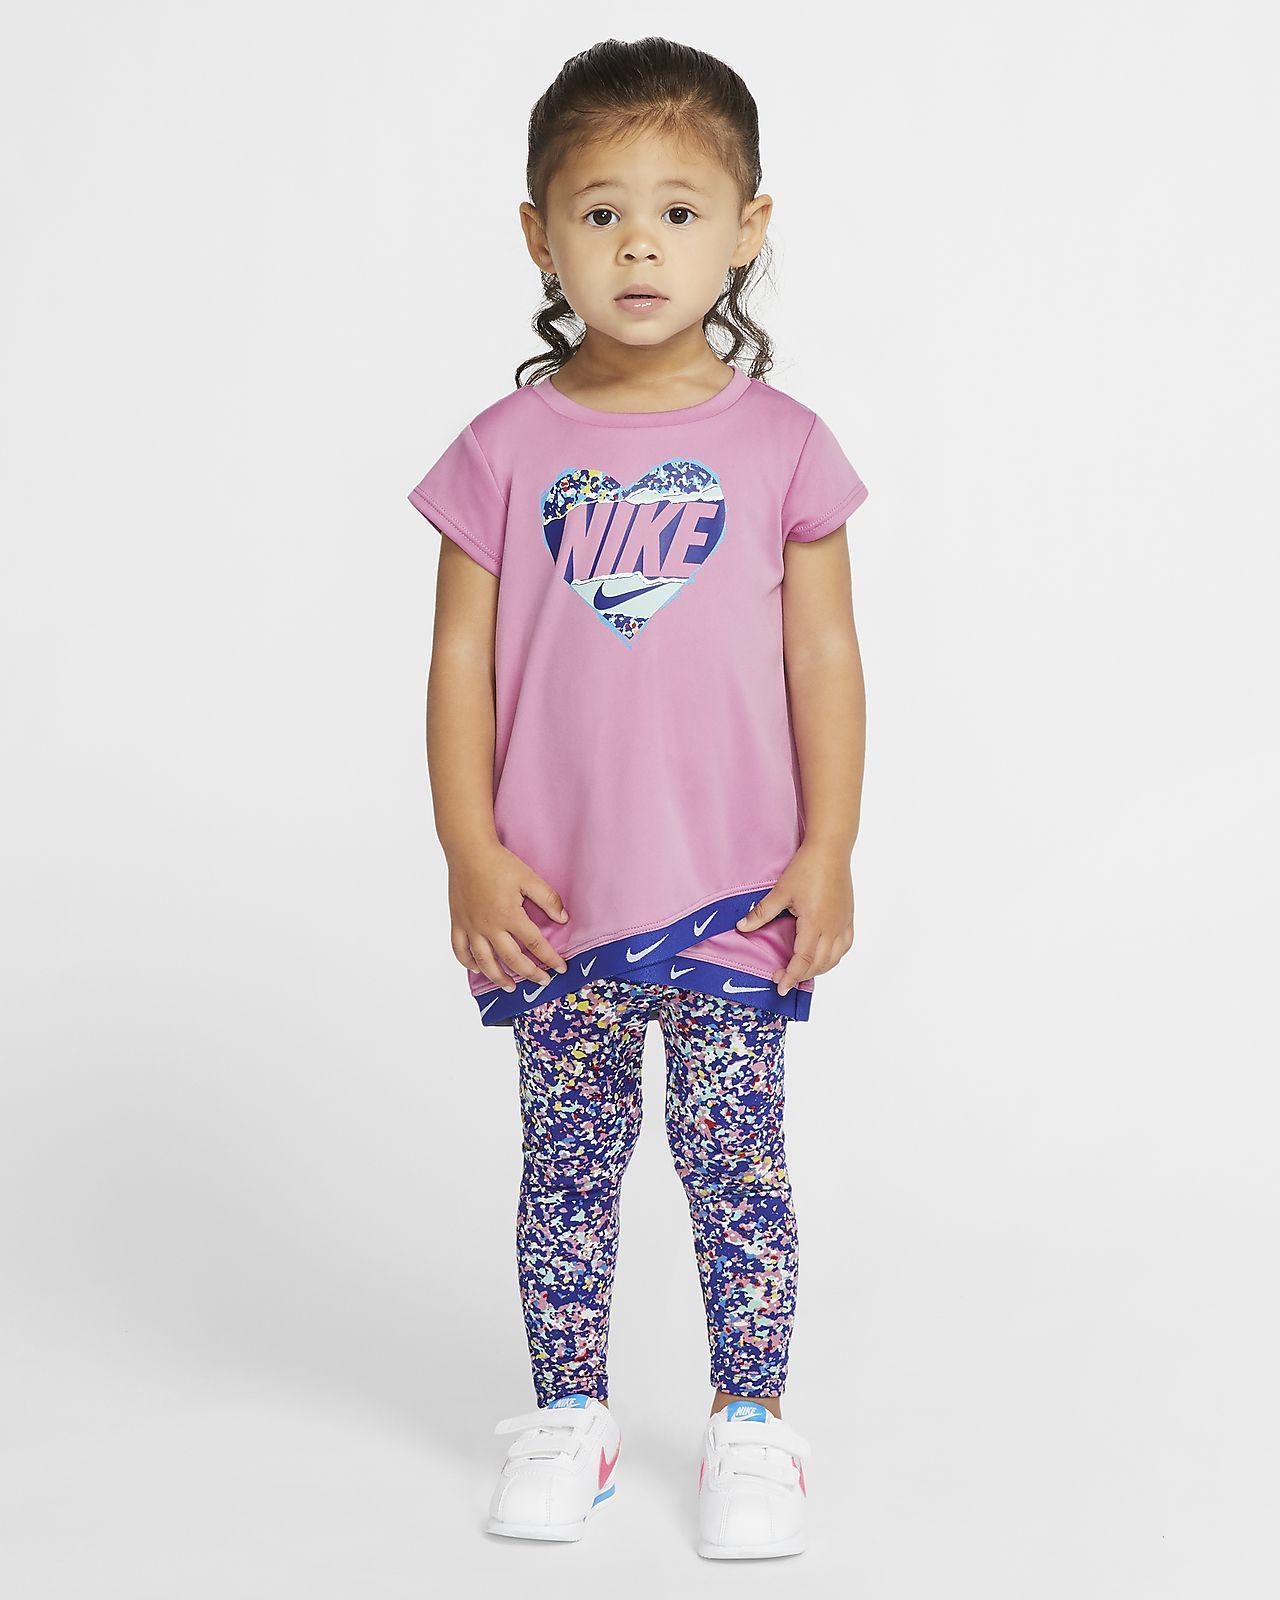 Nike Dri-FIT Baby (12-24M) Tunic Top and Leggings Set